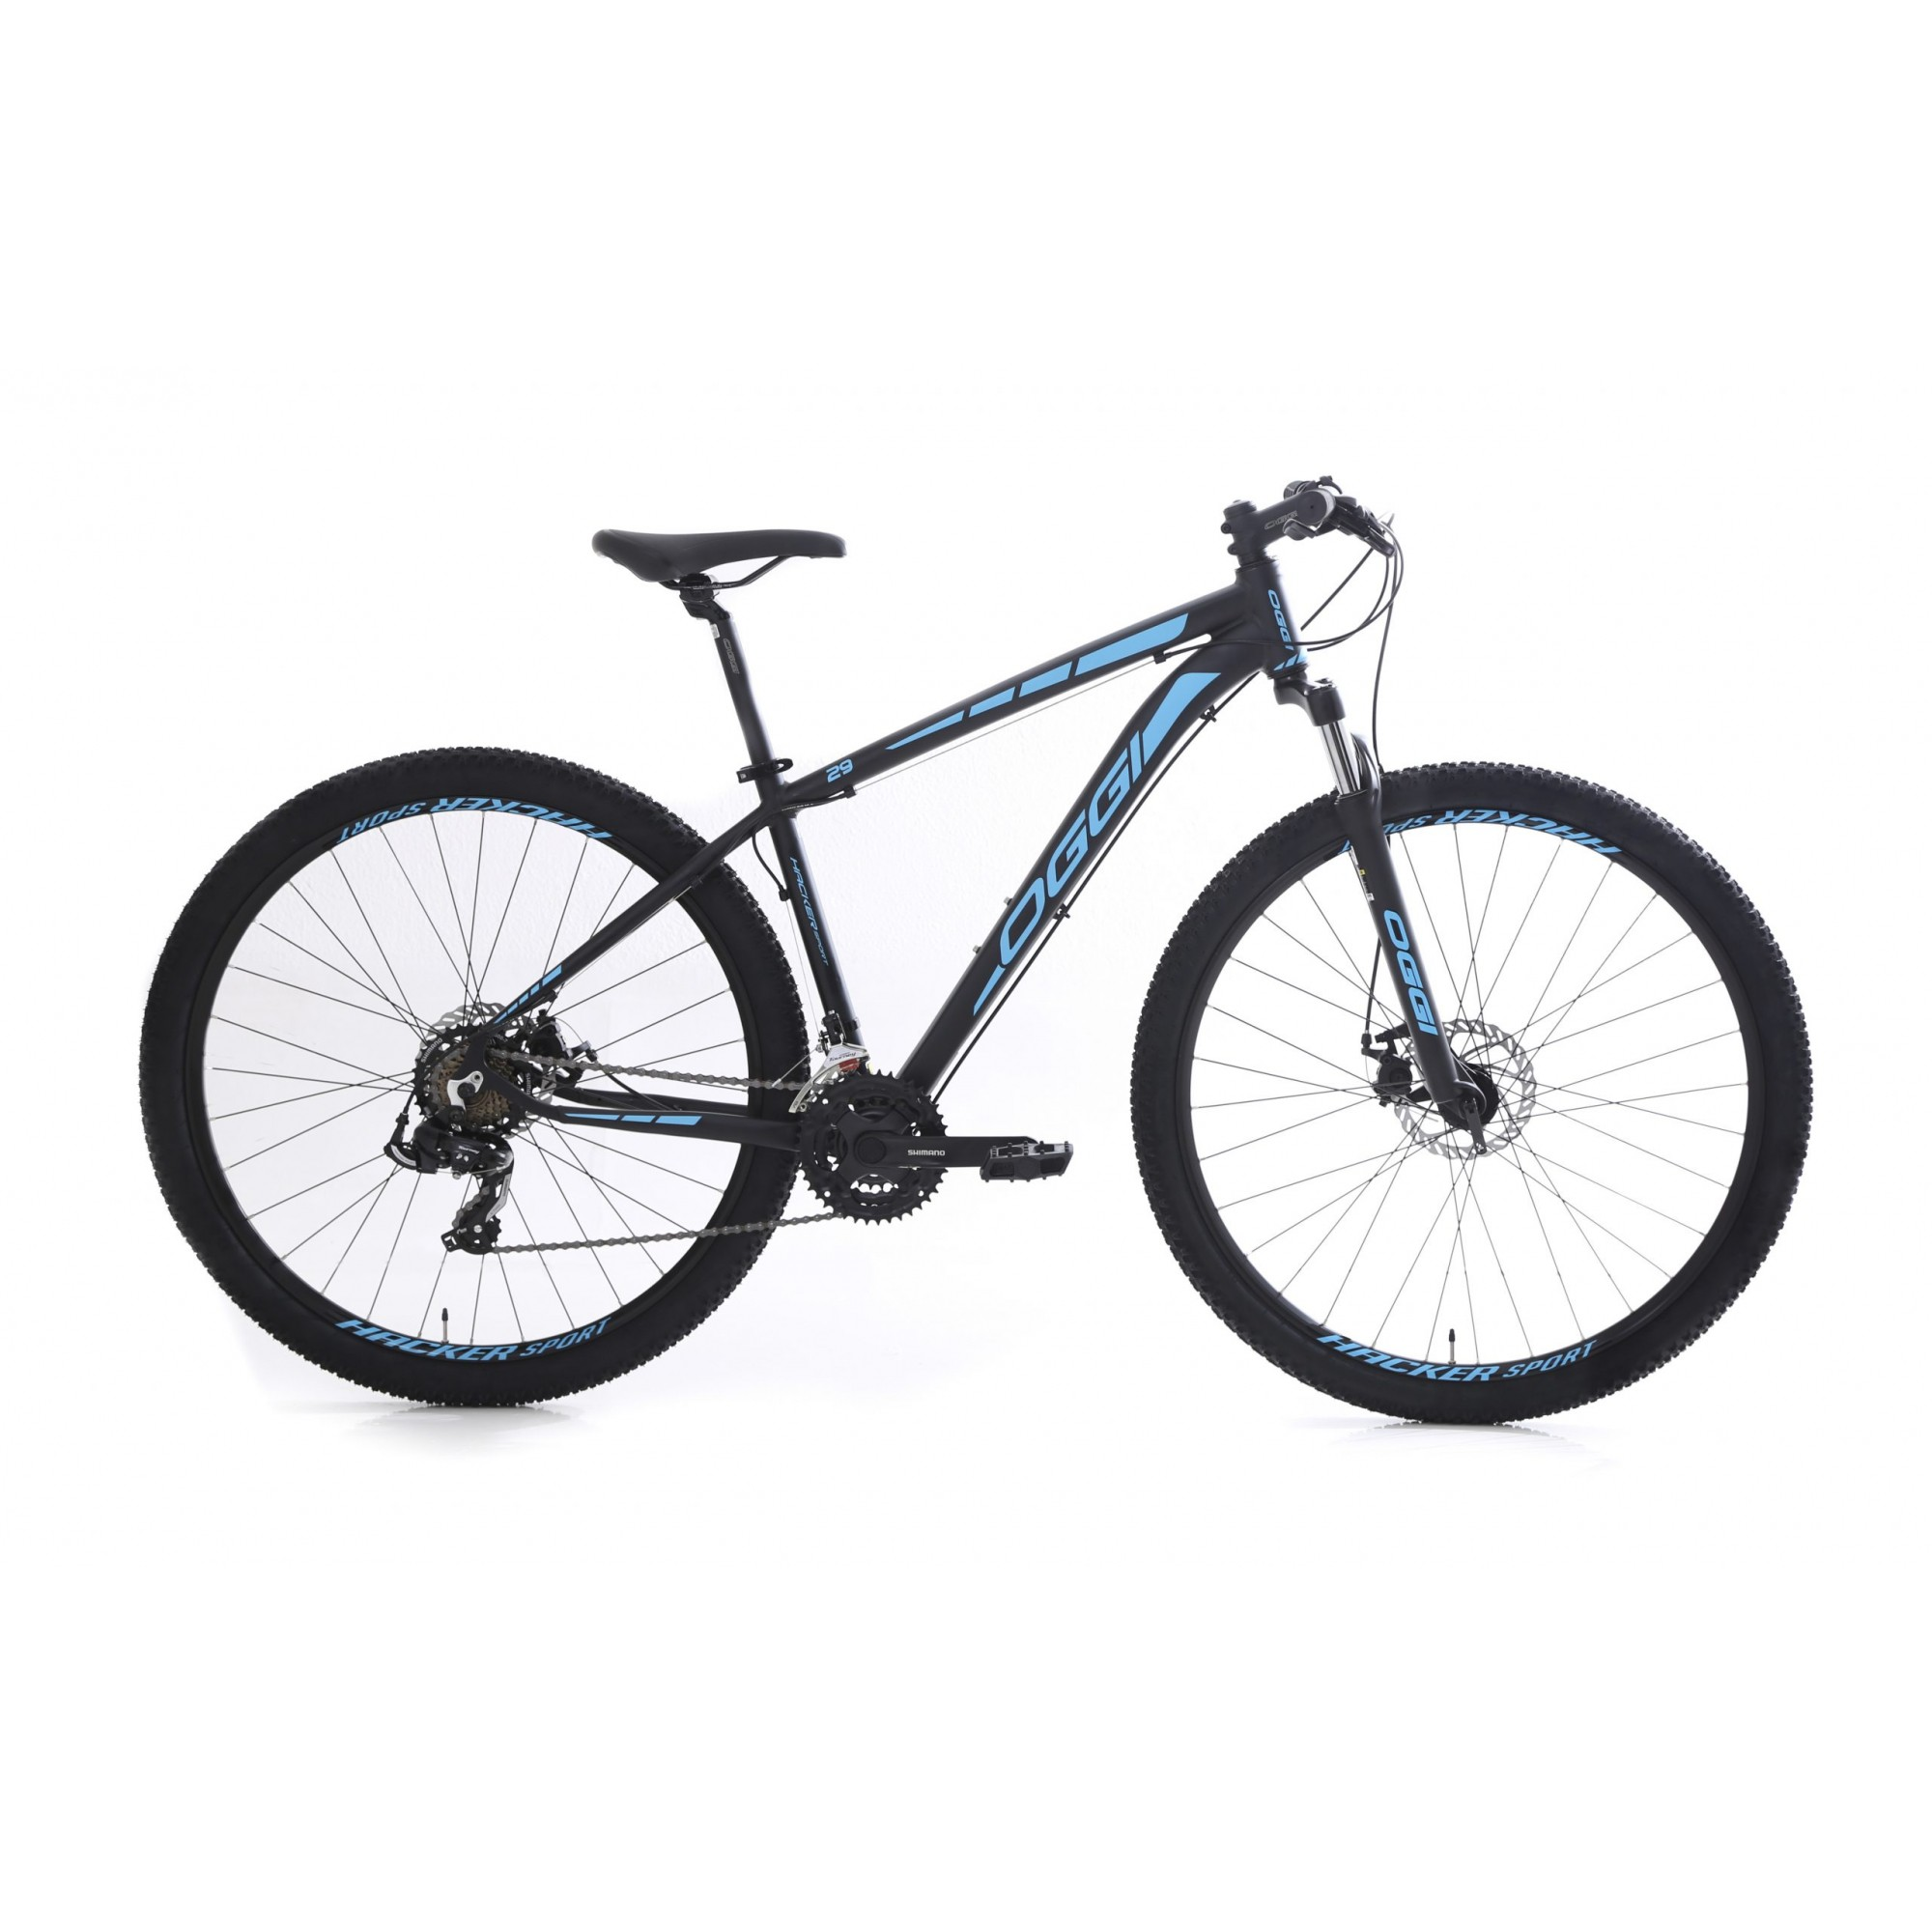 Bicicleta Oggi Aro 29 Hacker Sport Preto e Azul Tourney